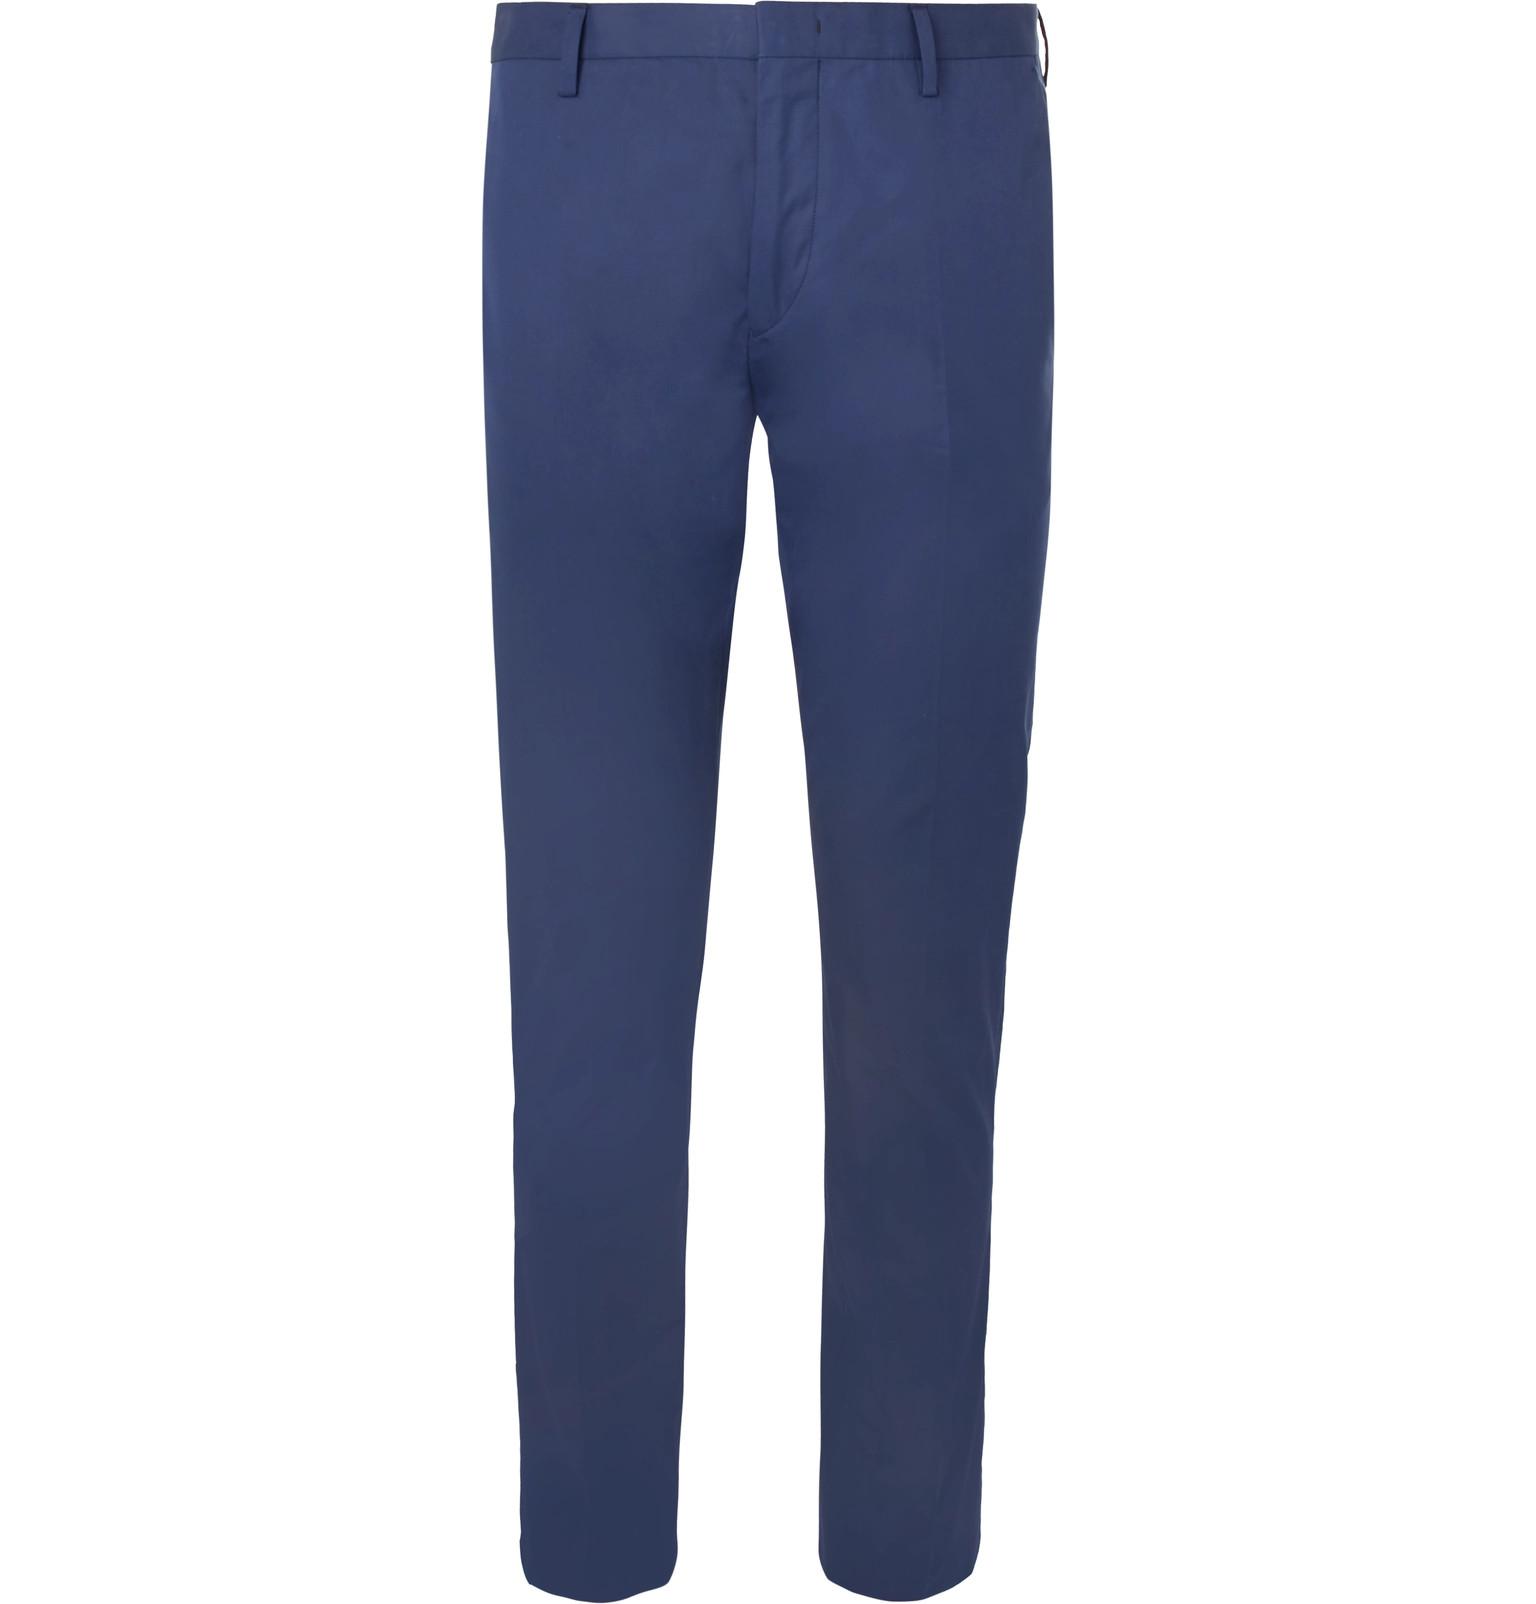 Royal-blue Soho Slim-fit Cotton Trousers Paul Smith ykMXeCaDmg